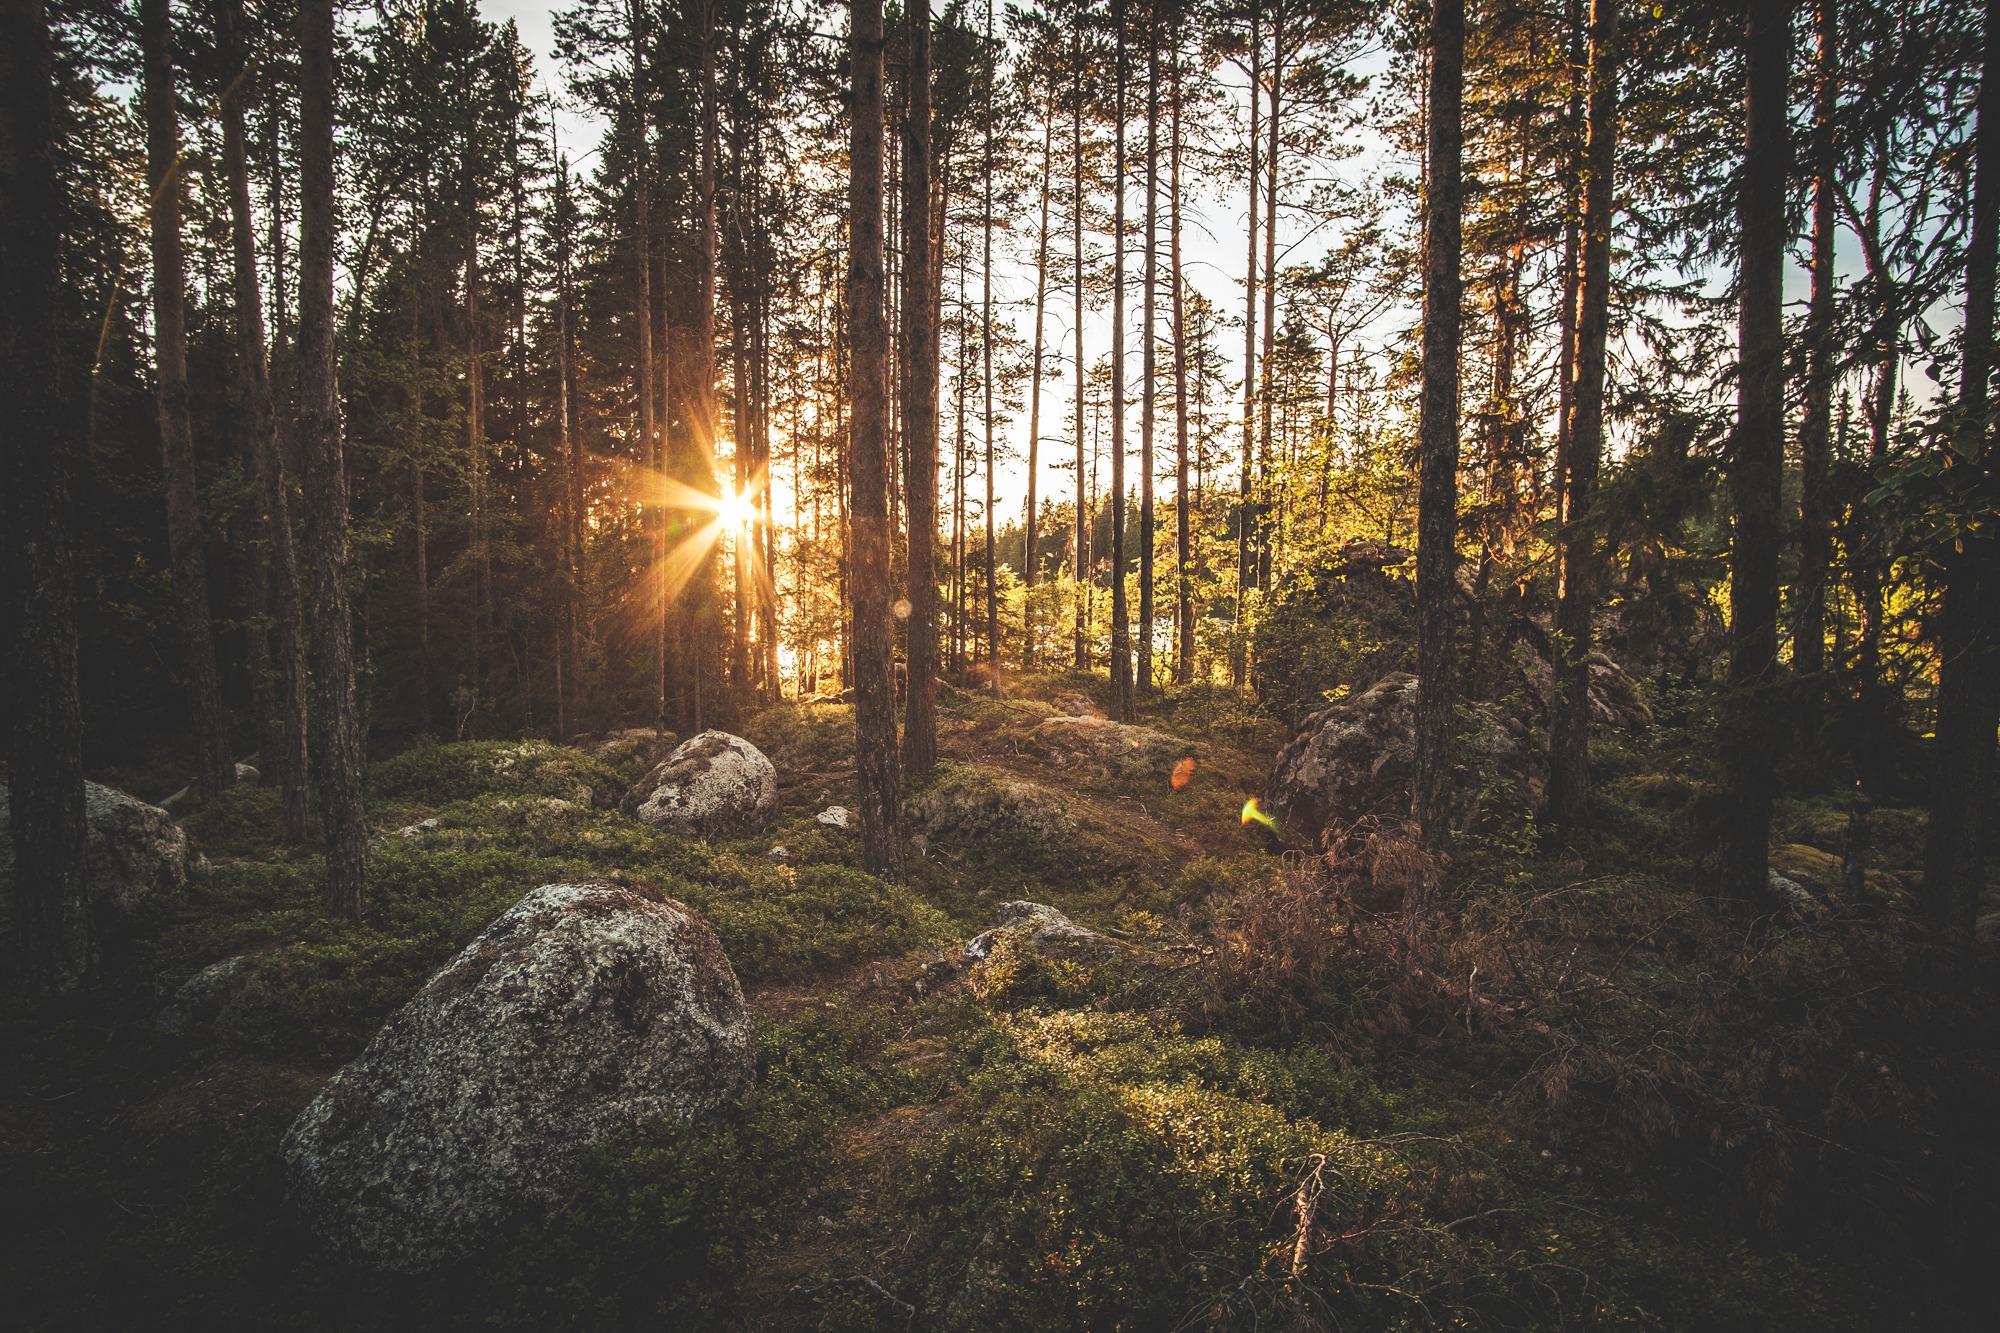 Gimaladen-Giman-Sweden-3.jpg